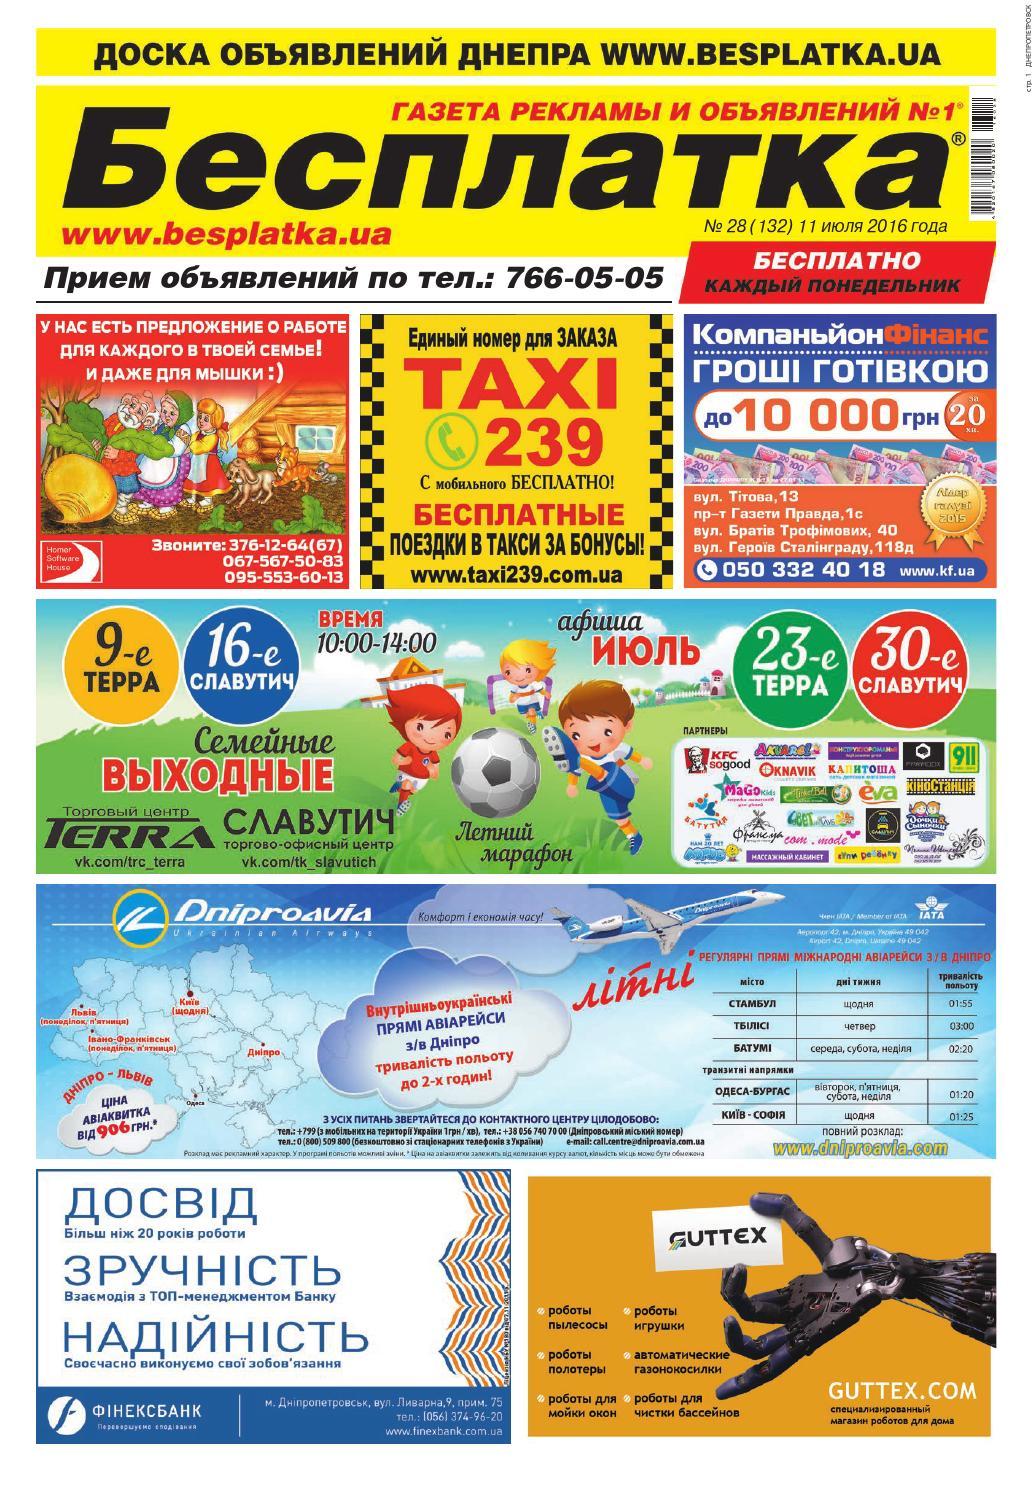 Besplatka  28 Днепр by besplatka ukraine - issuu 713df12e4fe6f